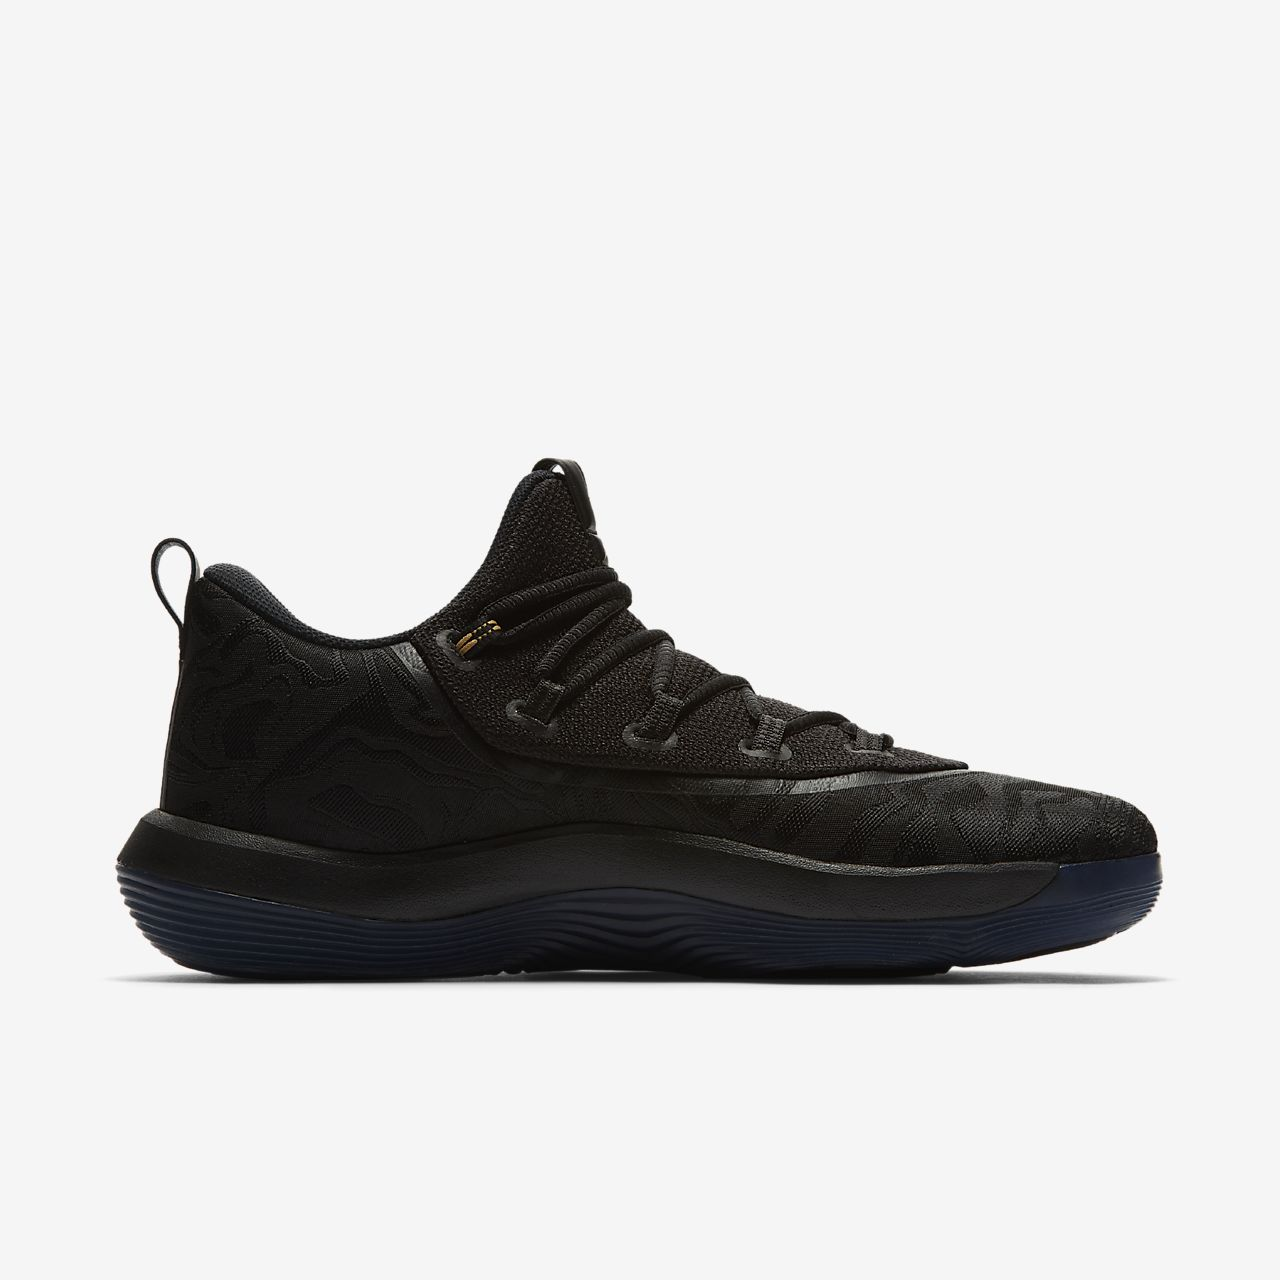 NIKE JORDAN SUPER. FLY 2017 Low PF Sneaker Scarpe da uomo Nero aa2547 021